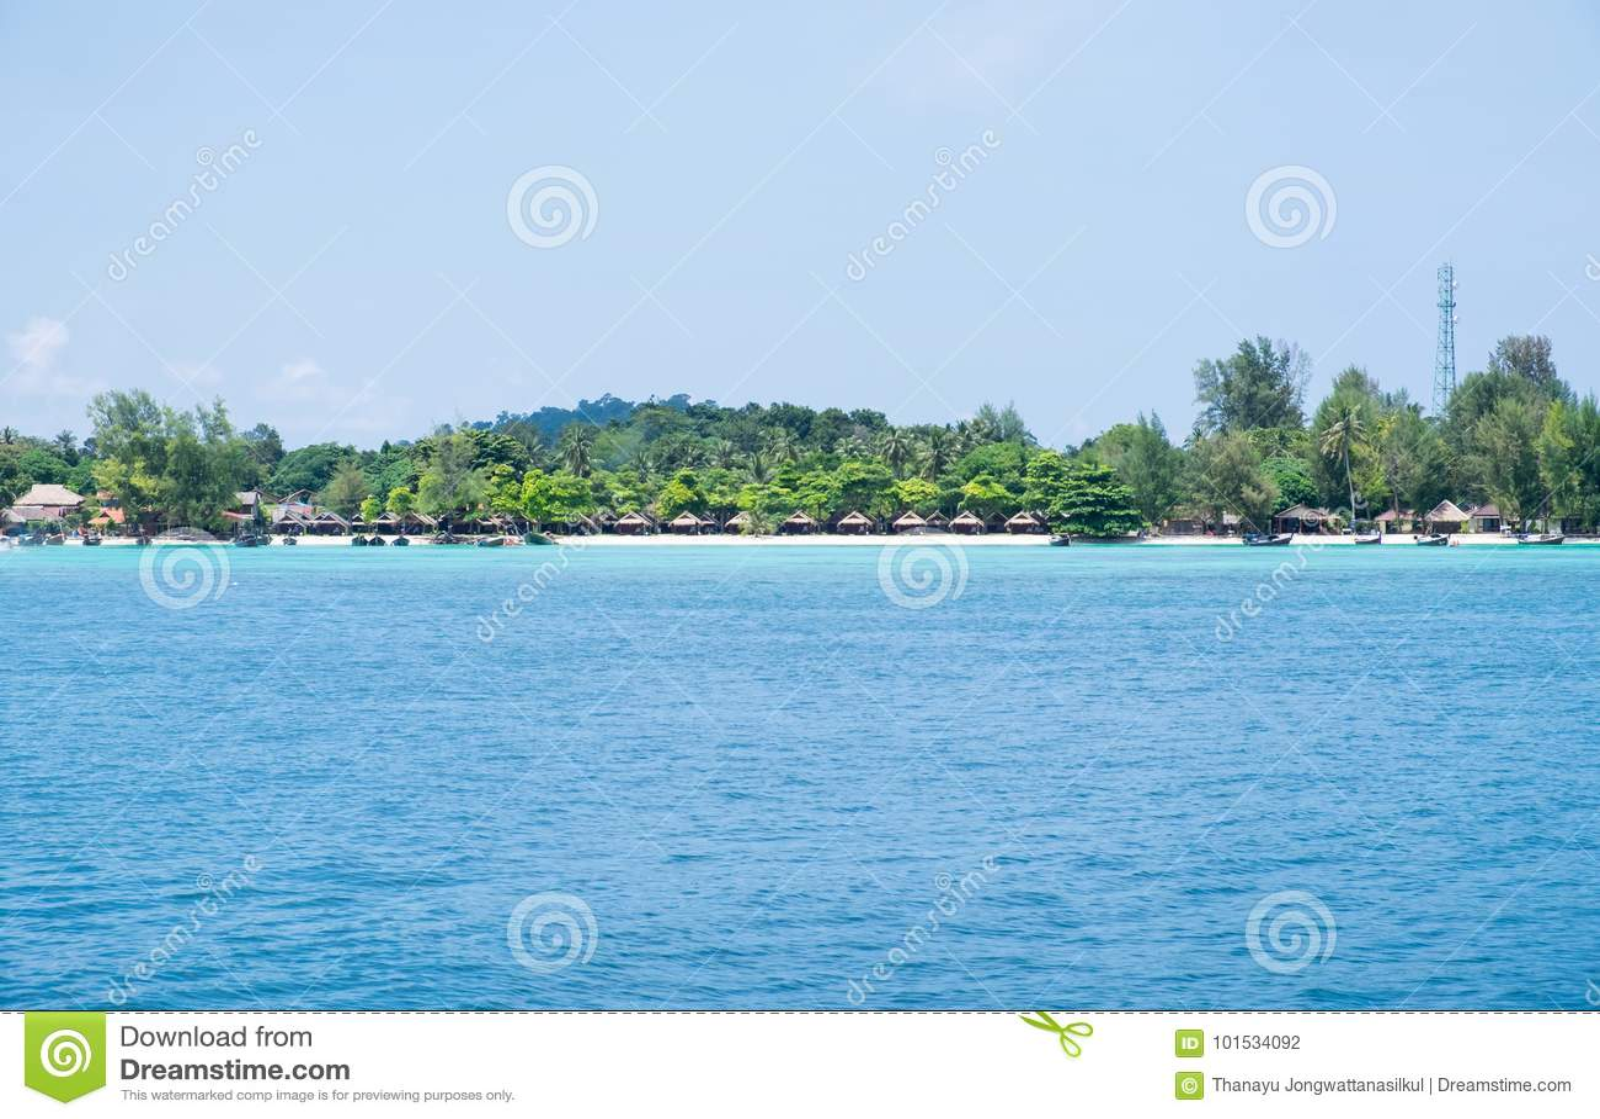 Blue sea with resort,most abundant coral reef at lipe island